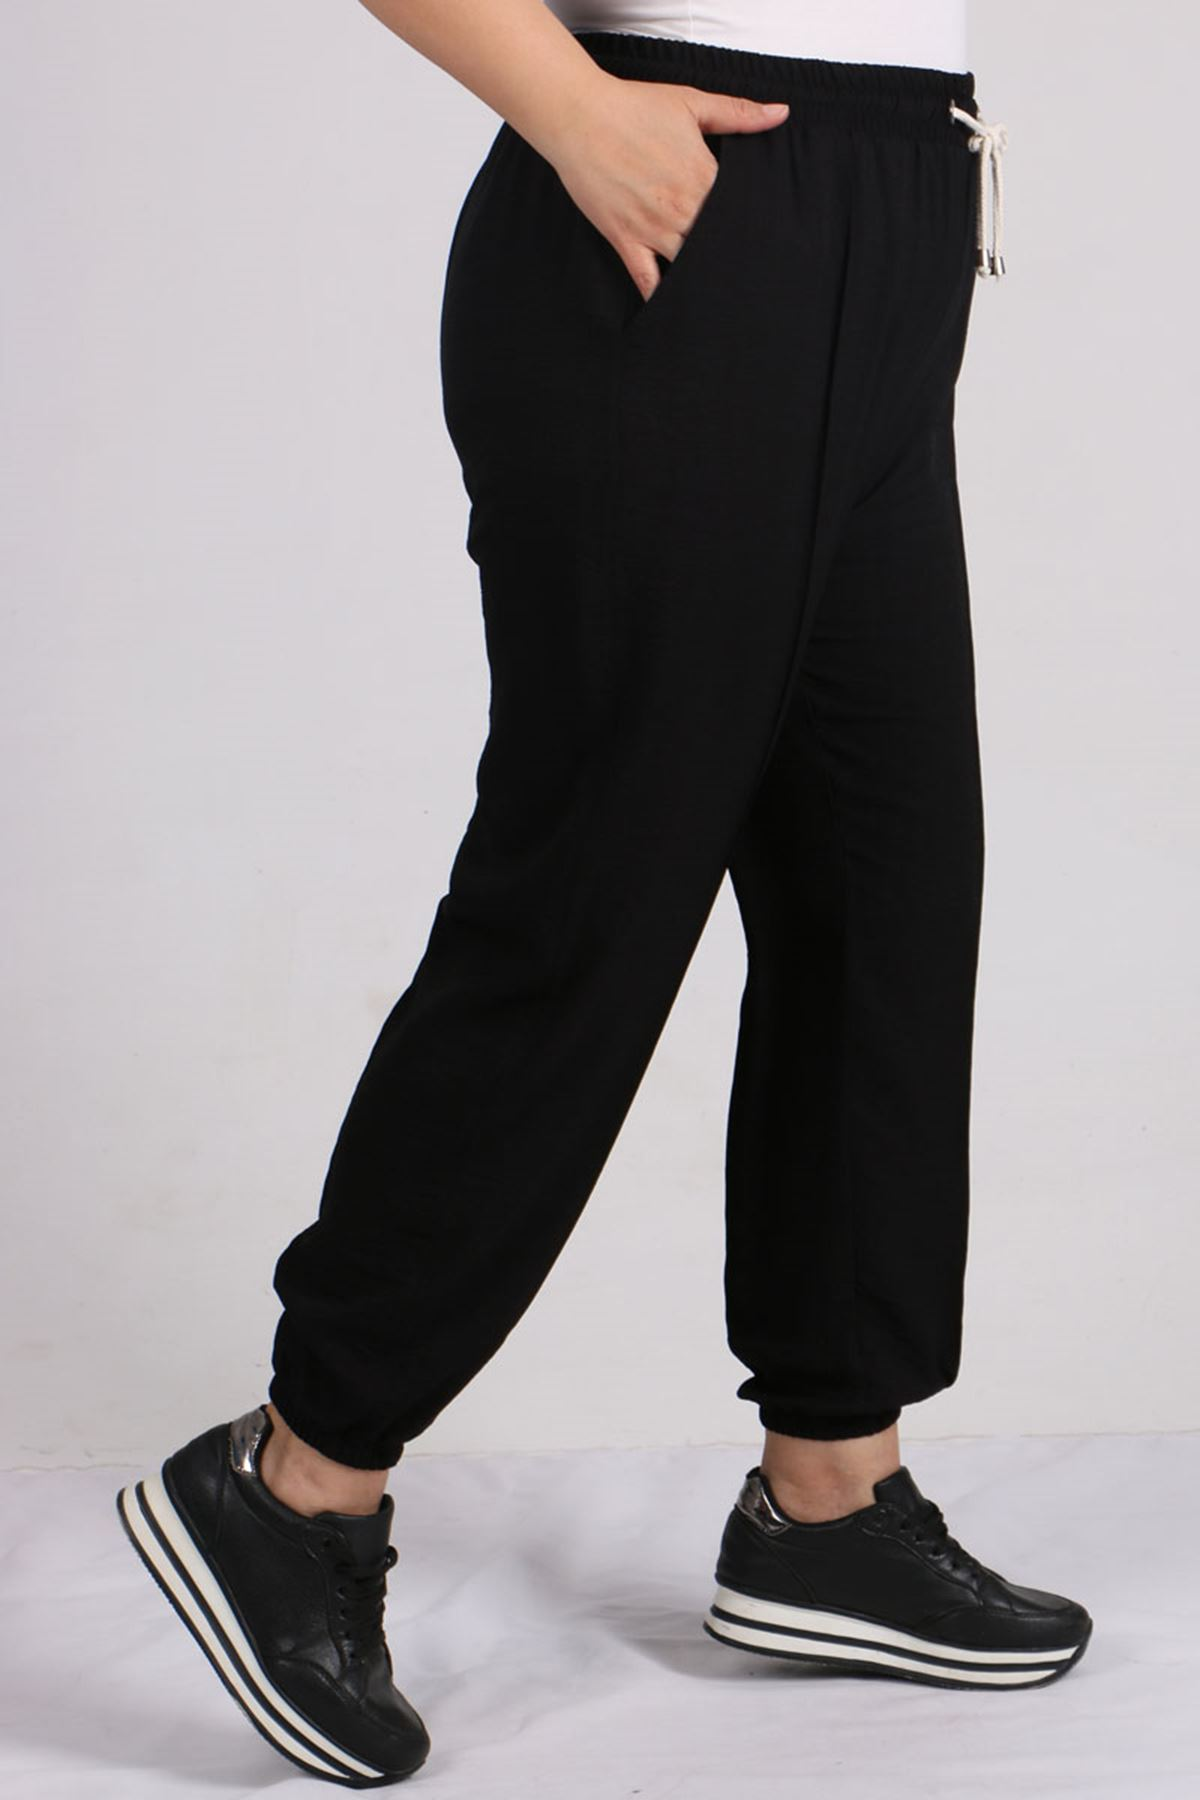 9147 Plus Size Elastic Waist Pants - Black